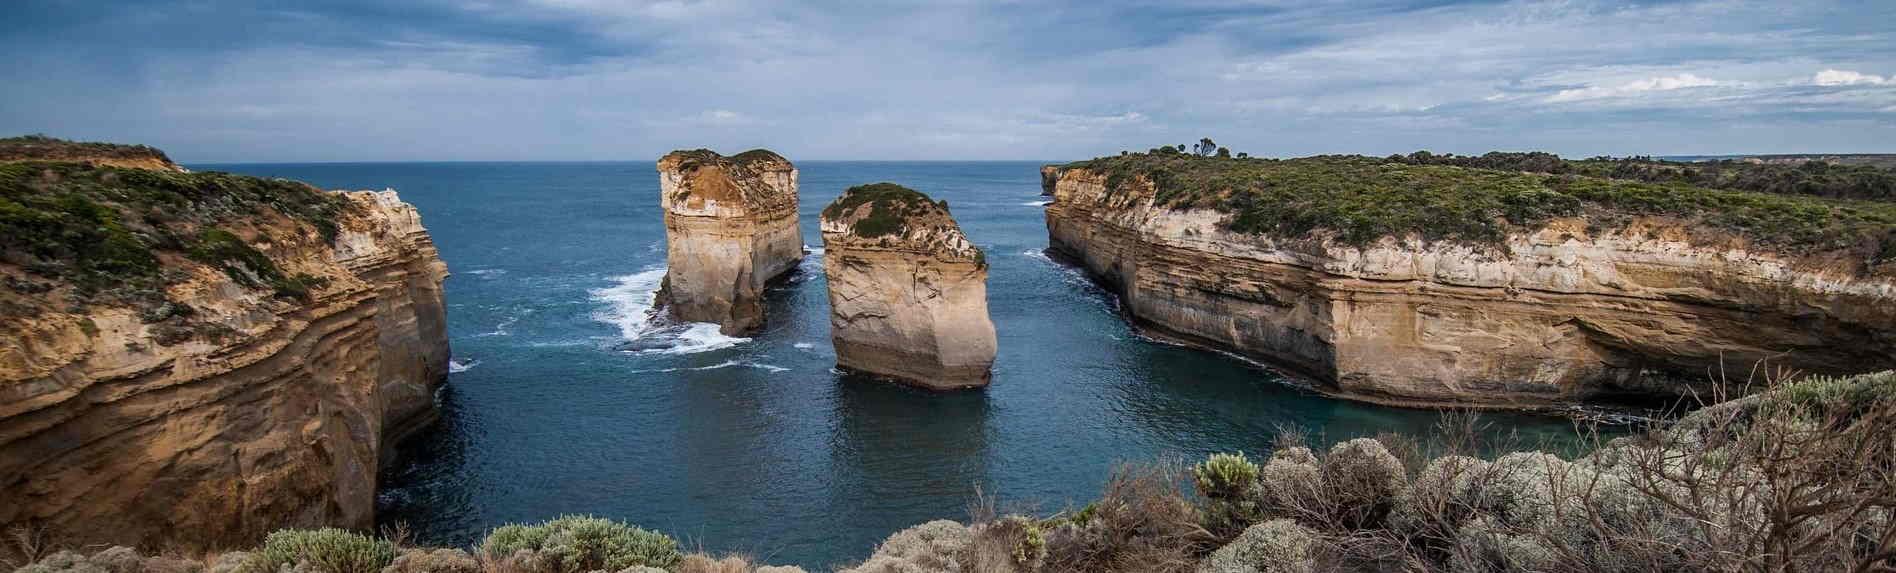 Australia's Best Natural Wonders